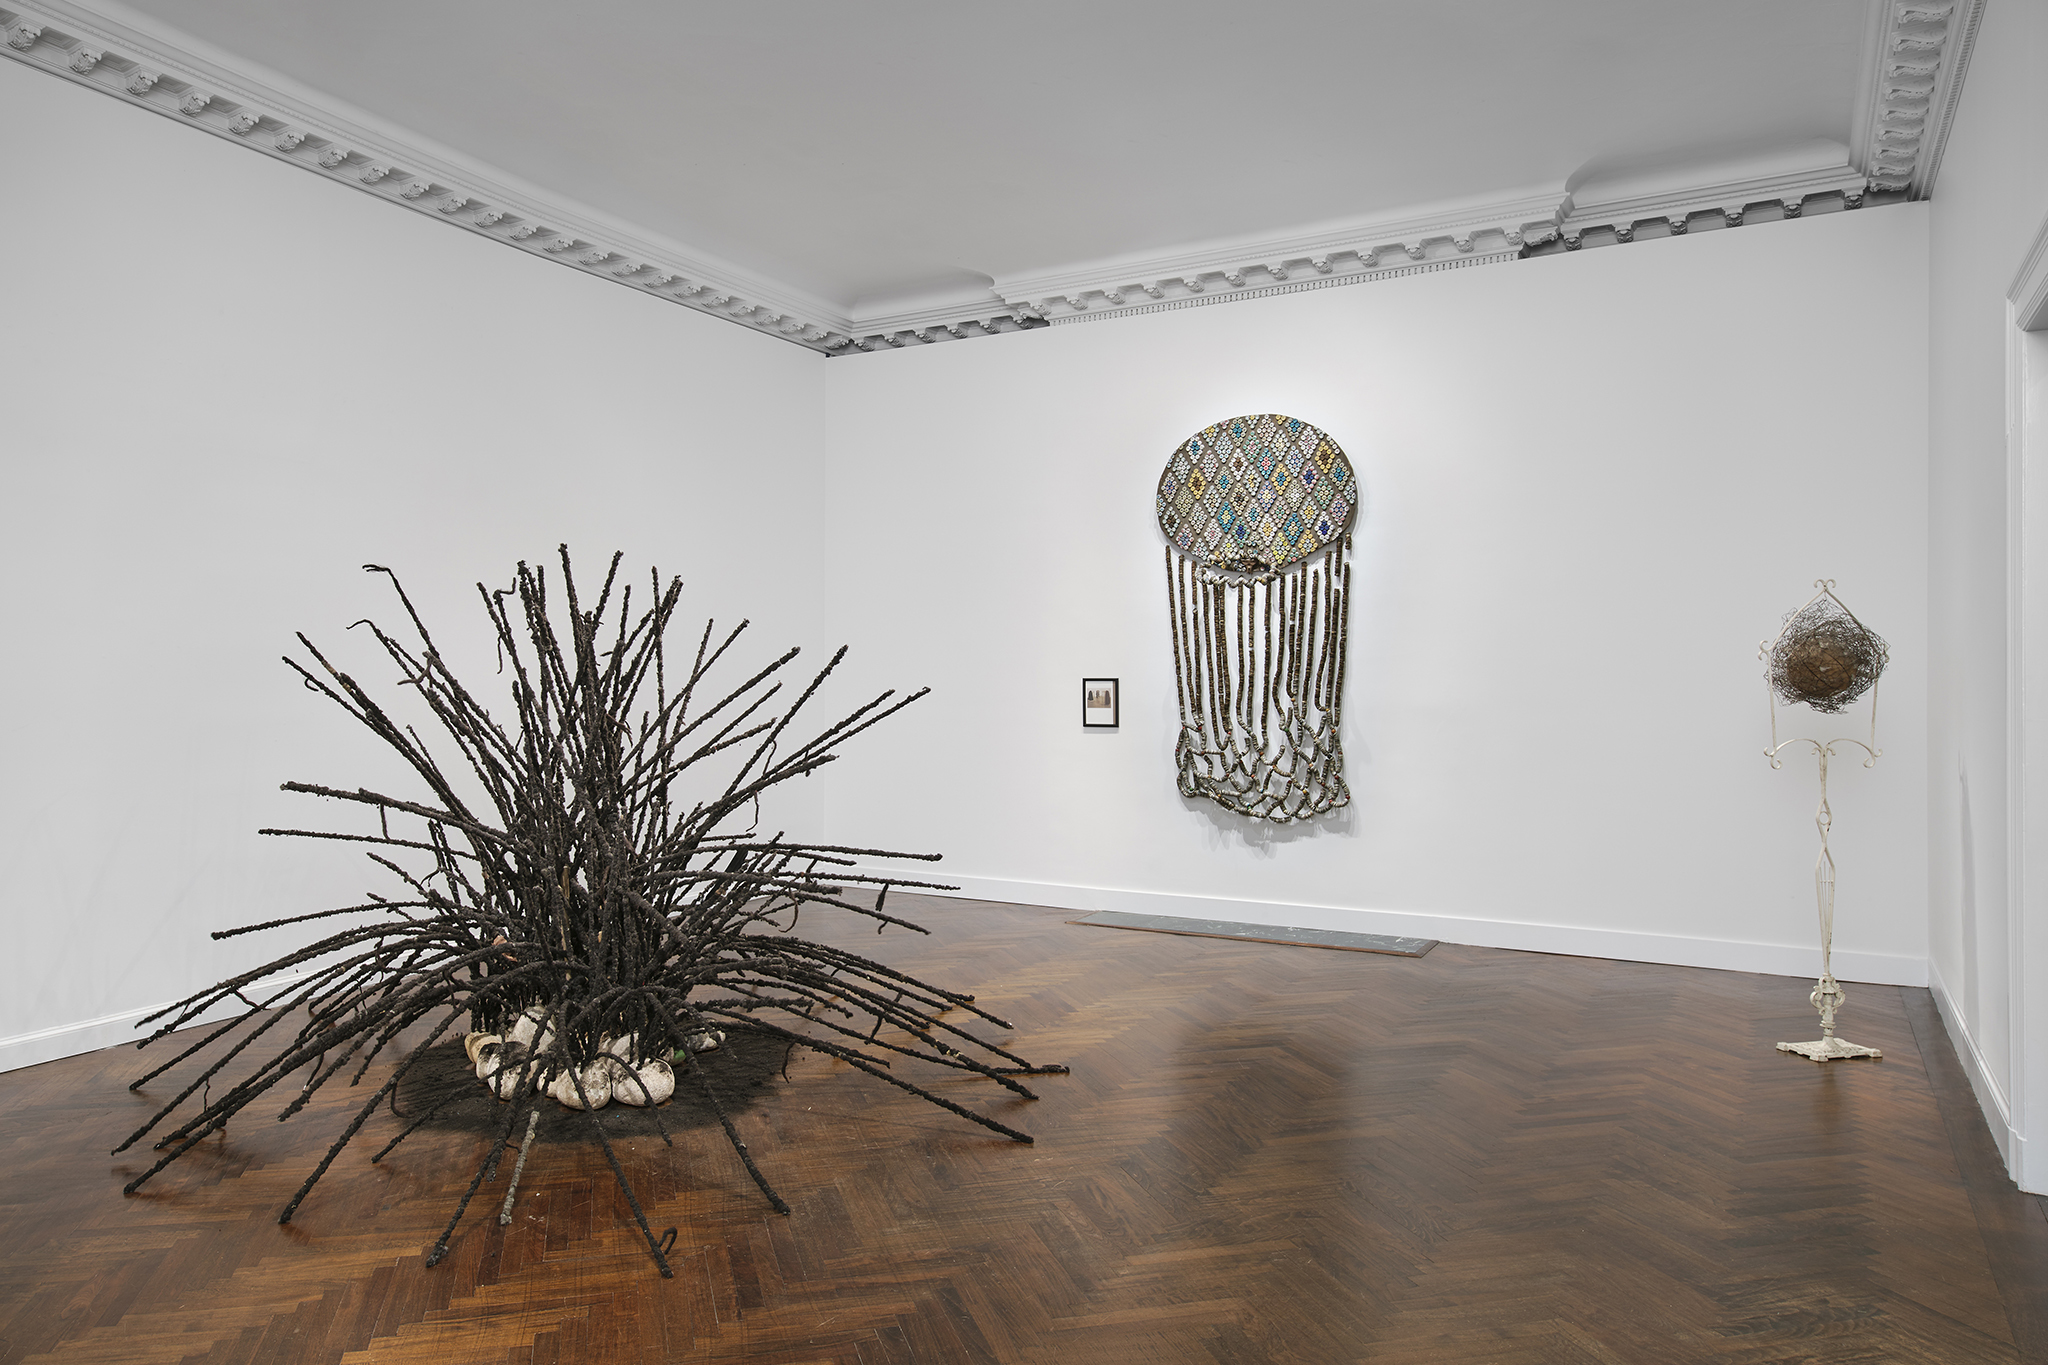 Installation view of David Hammons at Mnuchin Gallery, New York